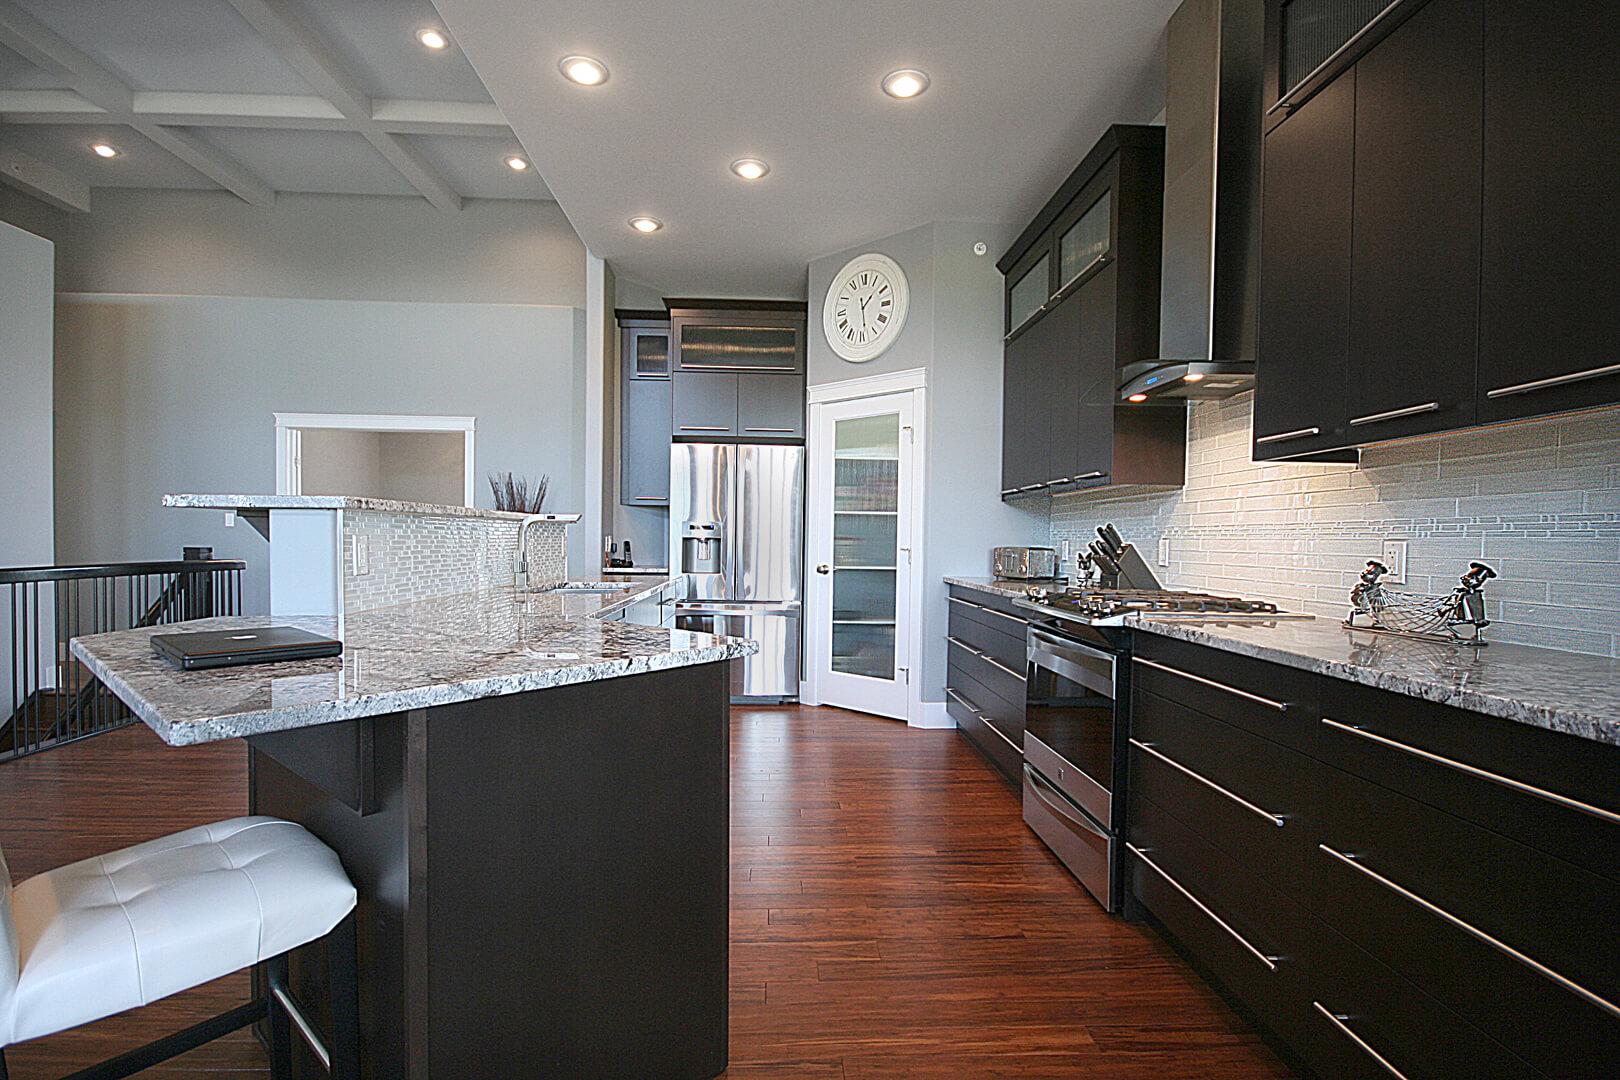 shearing_rococo-homes_kitchen